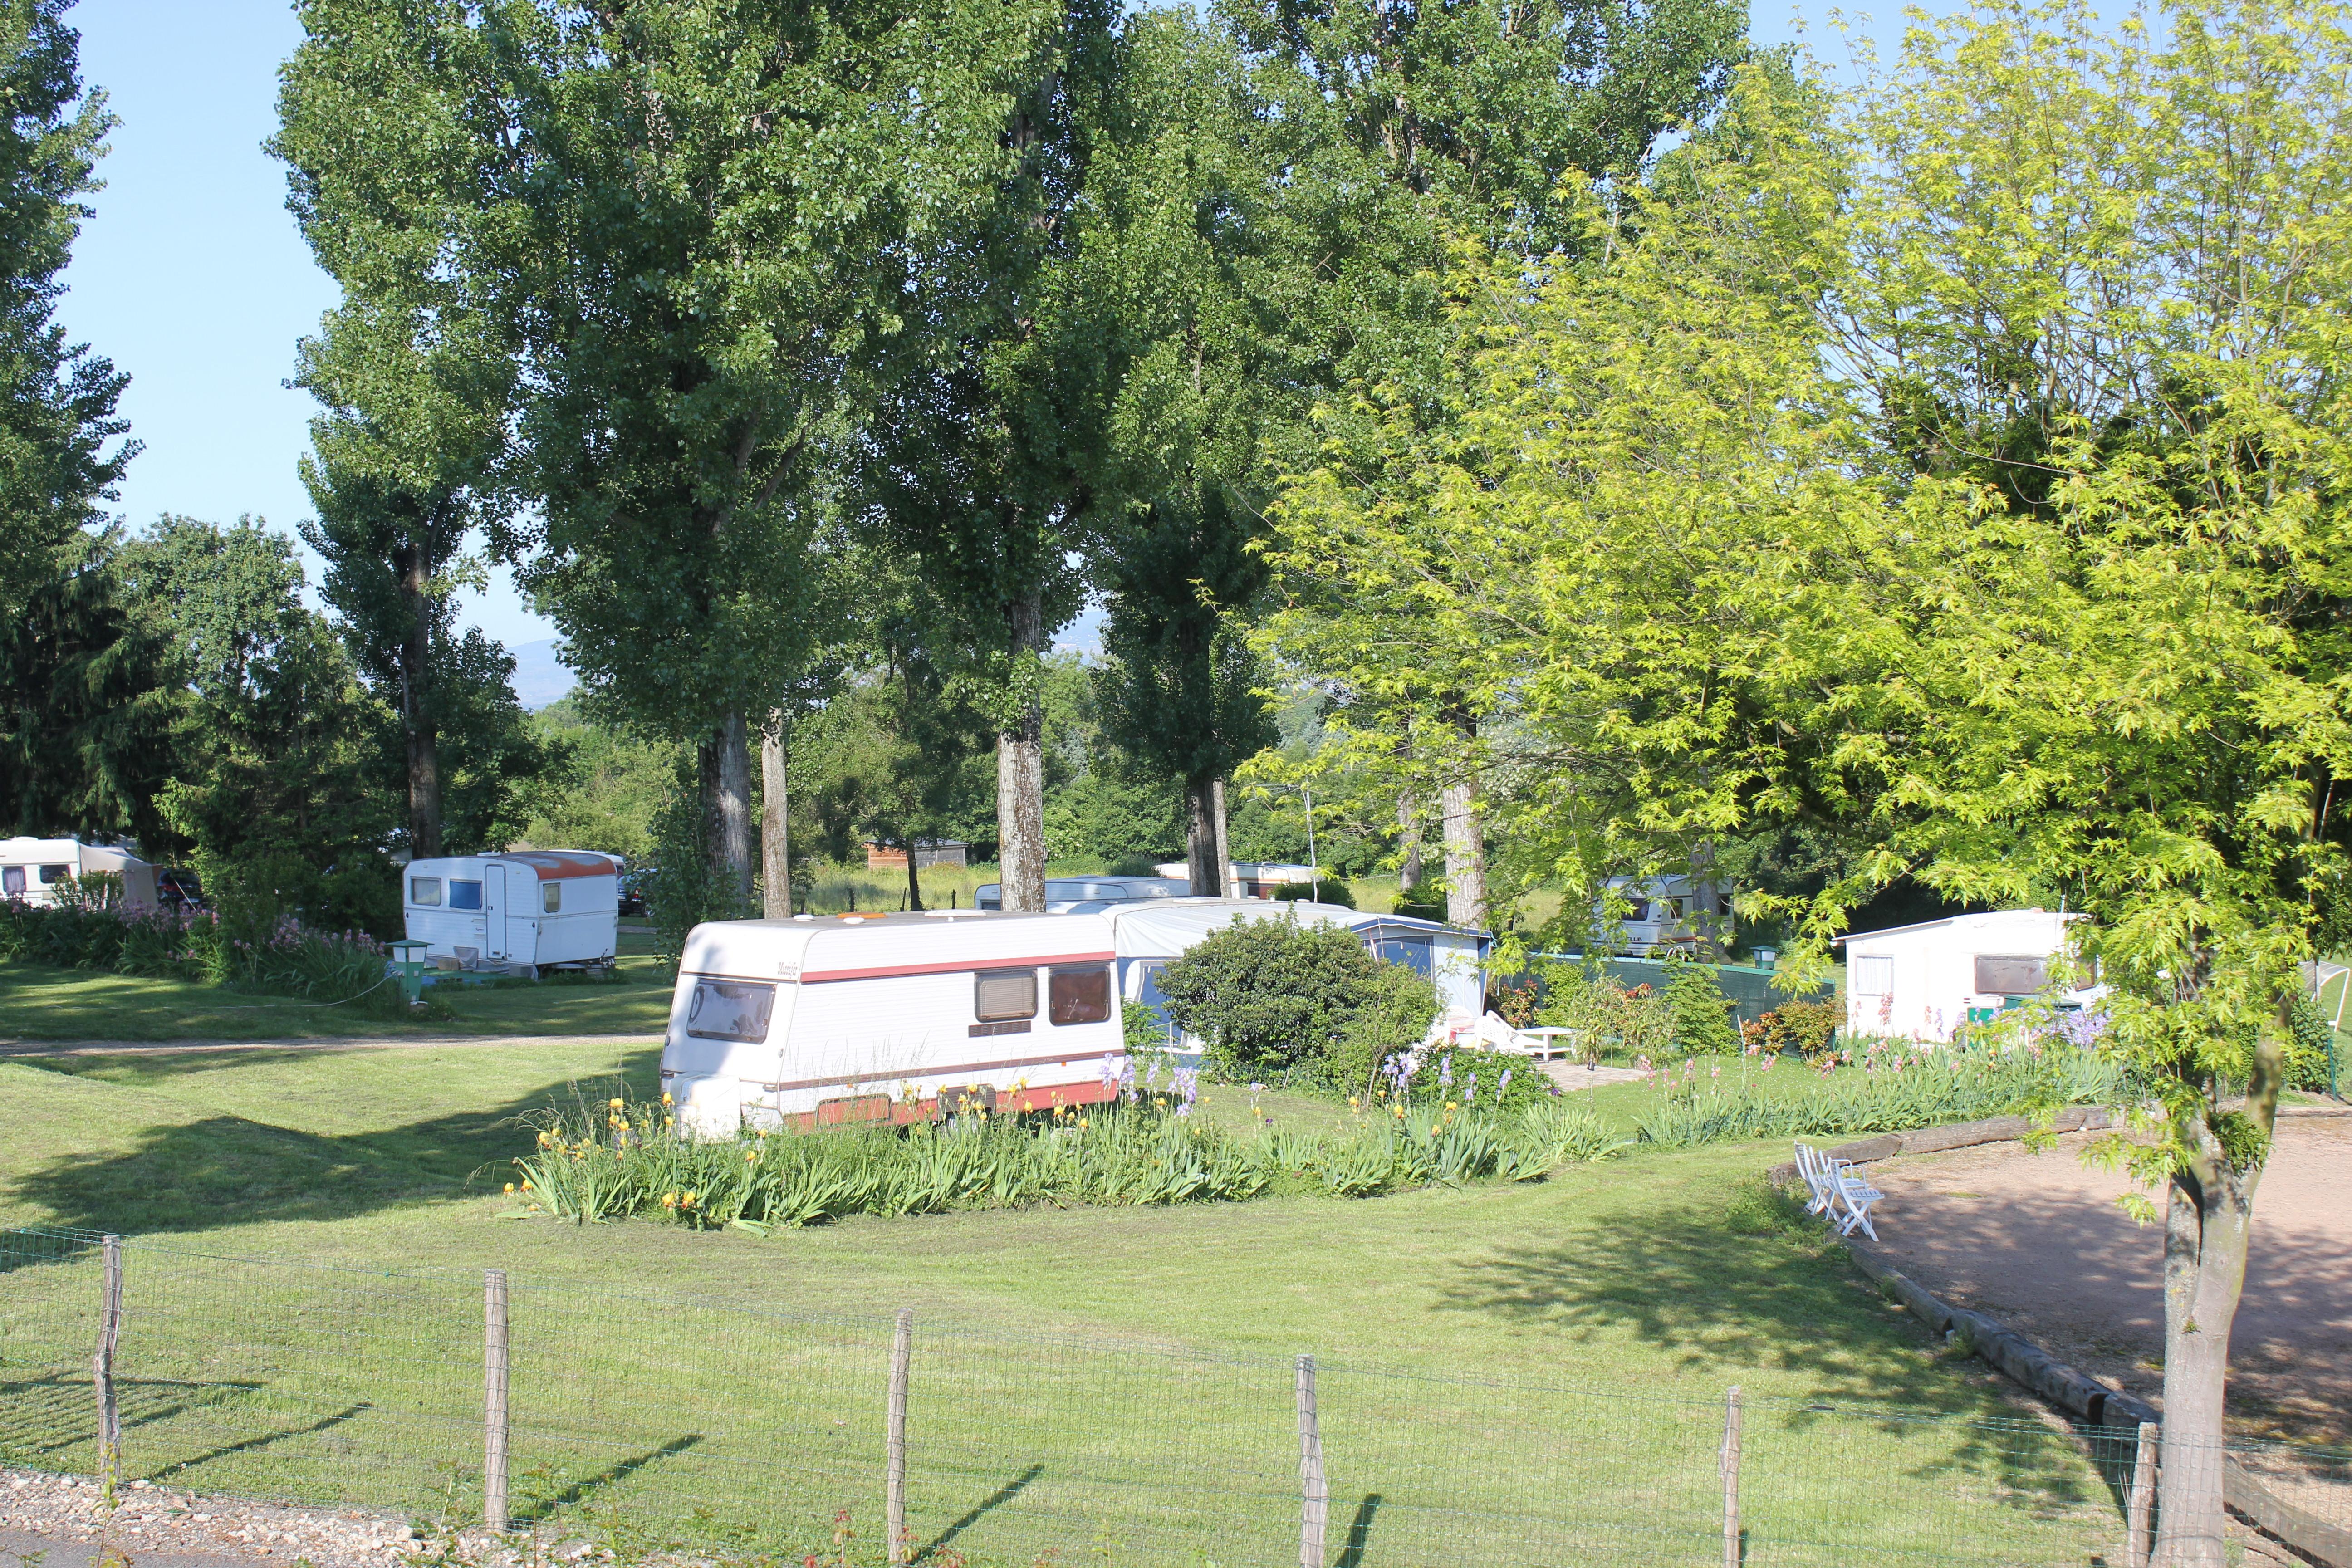 Camping municipal de Messimy-sur-Saône